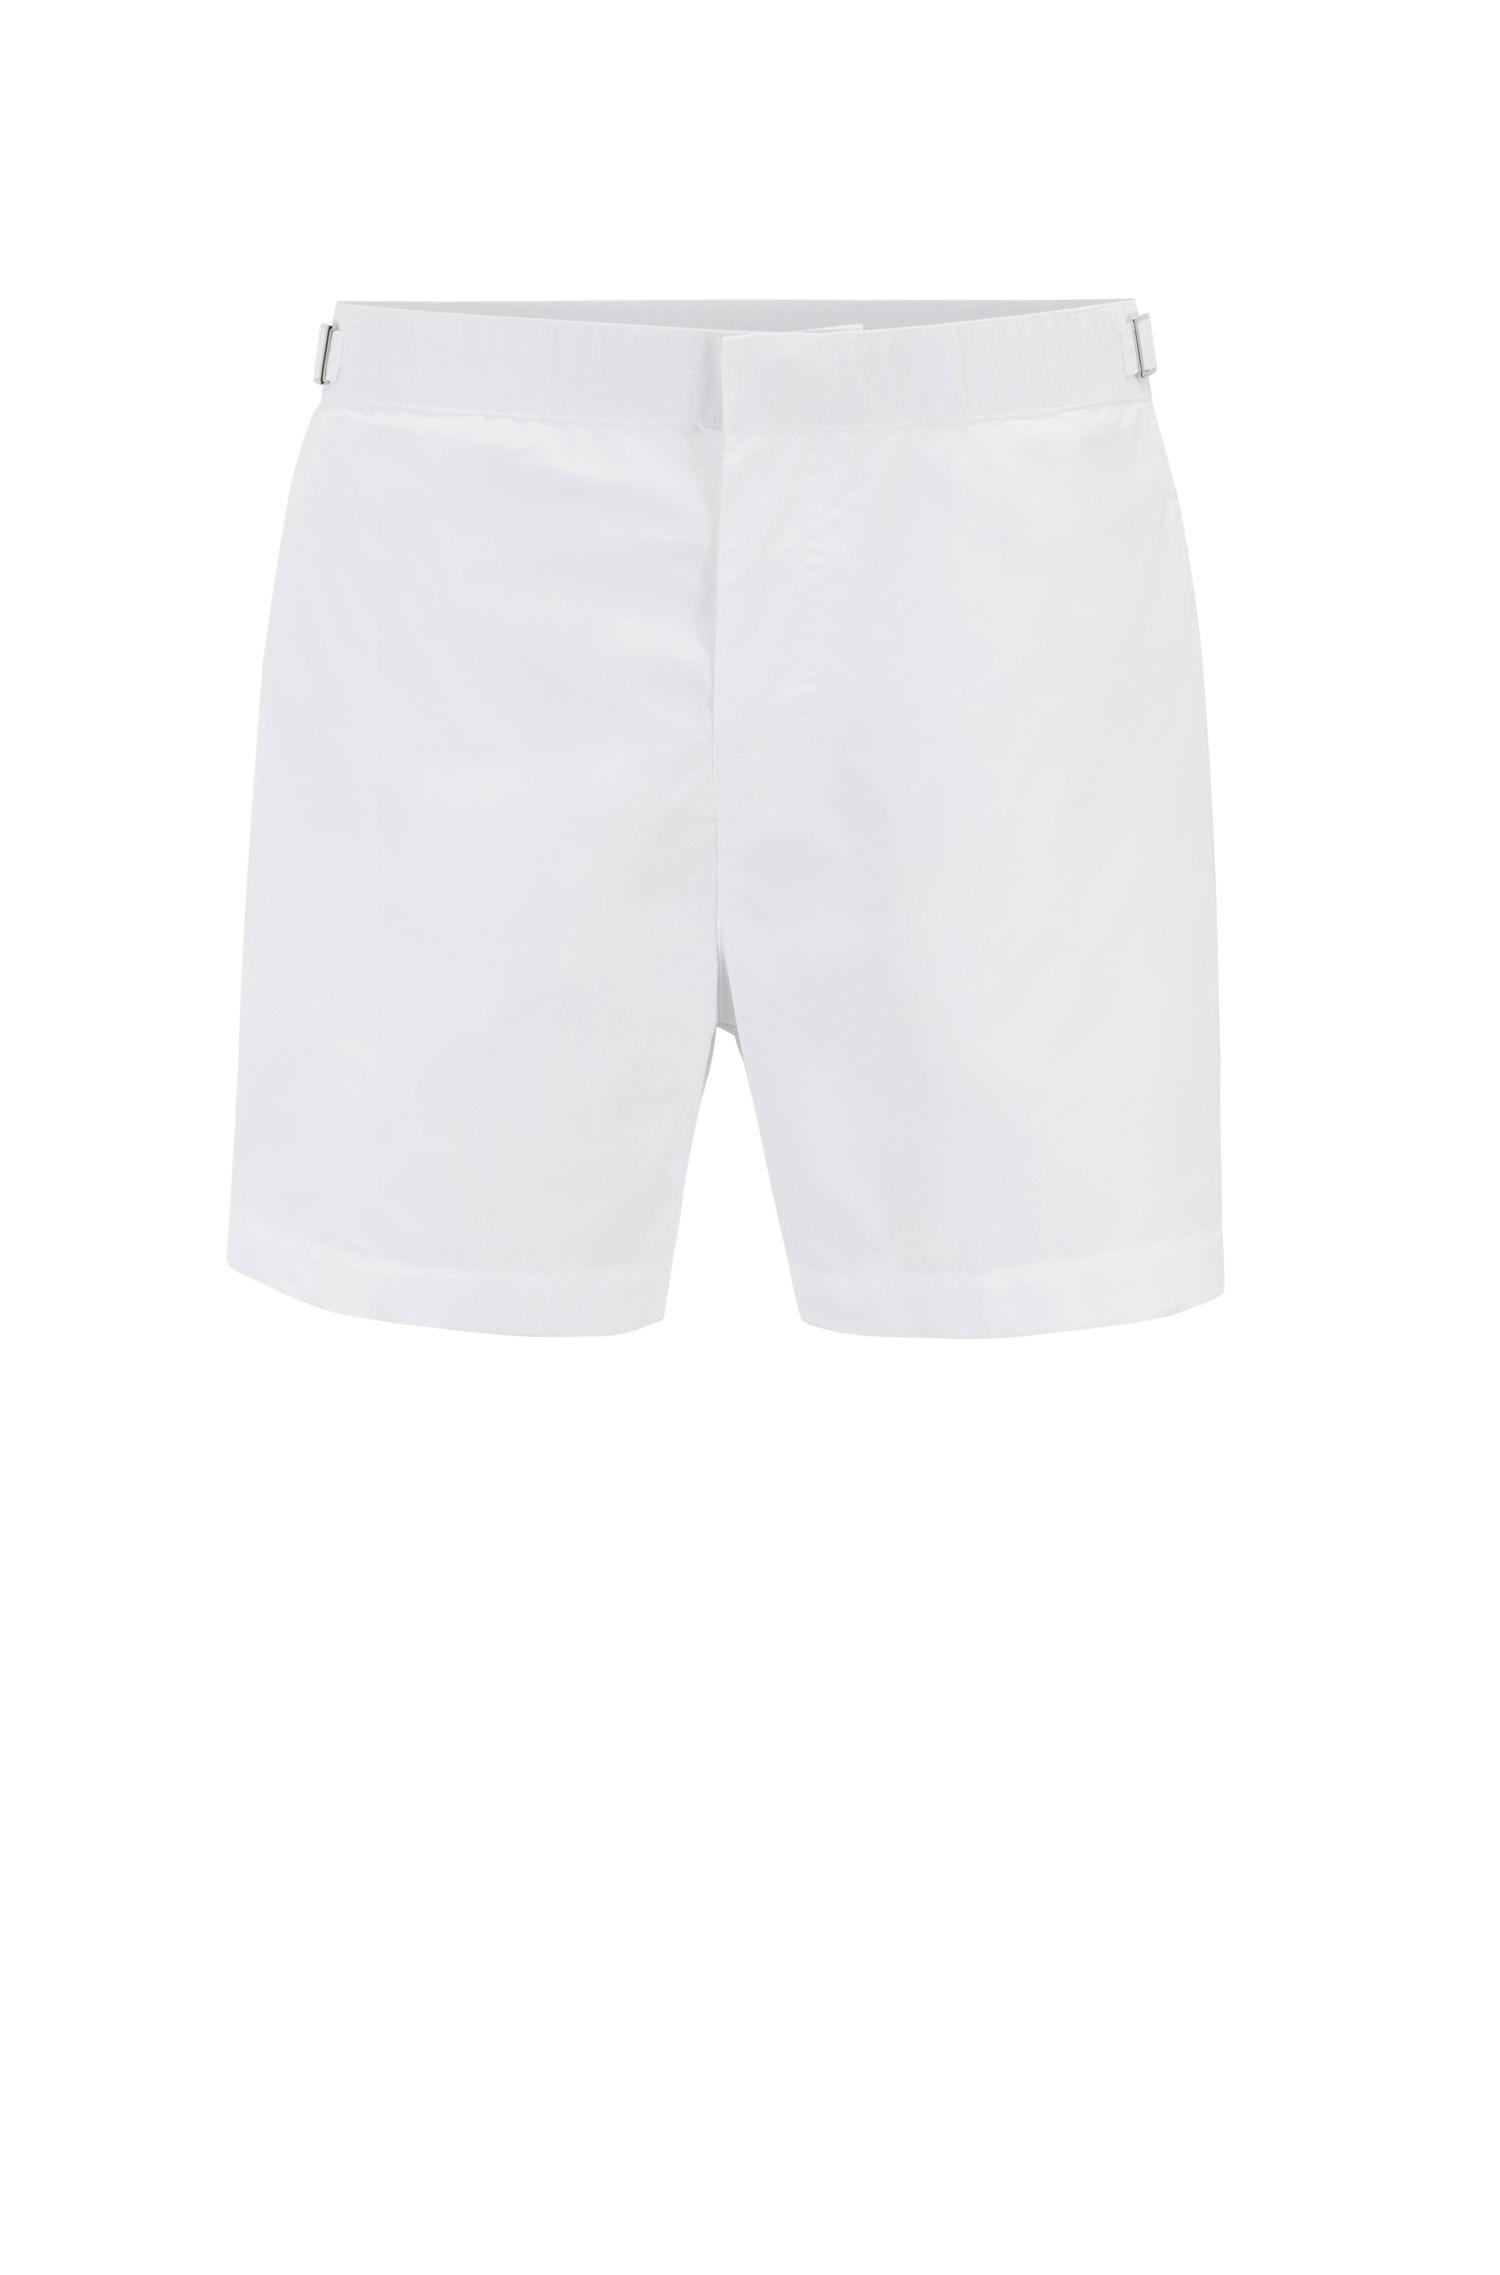 Sneldrogende zwemshort met print en verstelbare tailleband, Wit